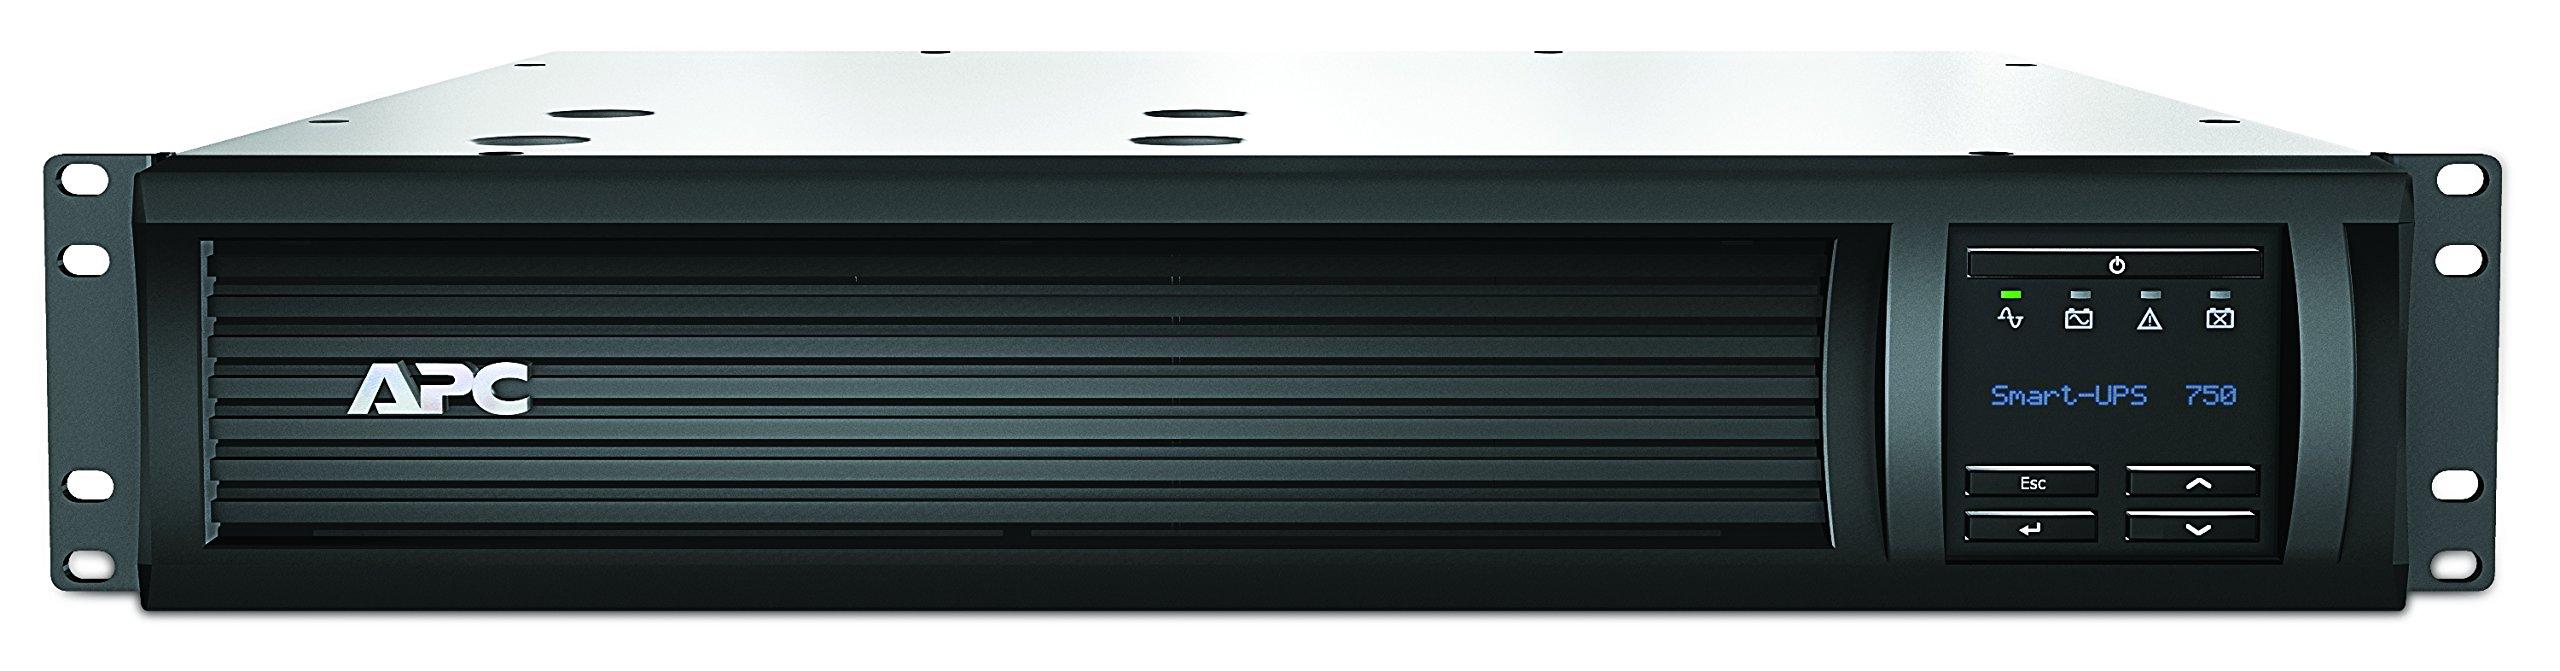 APC 750VA Smart-UPS Rackmount Sine Wave UPS (SMT750RM2U) by APC